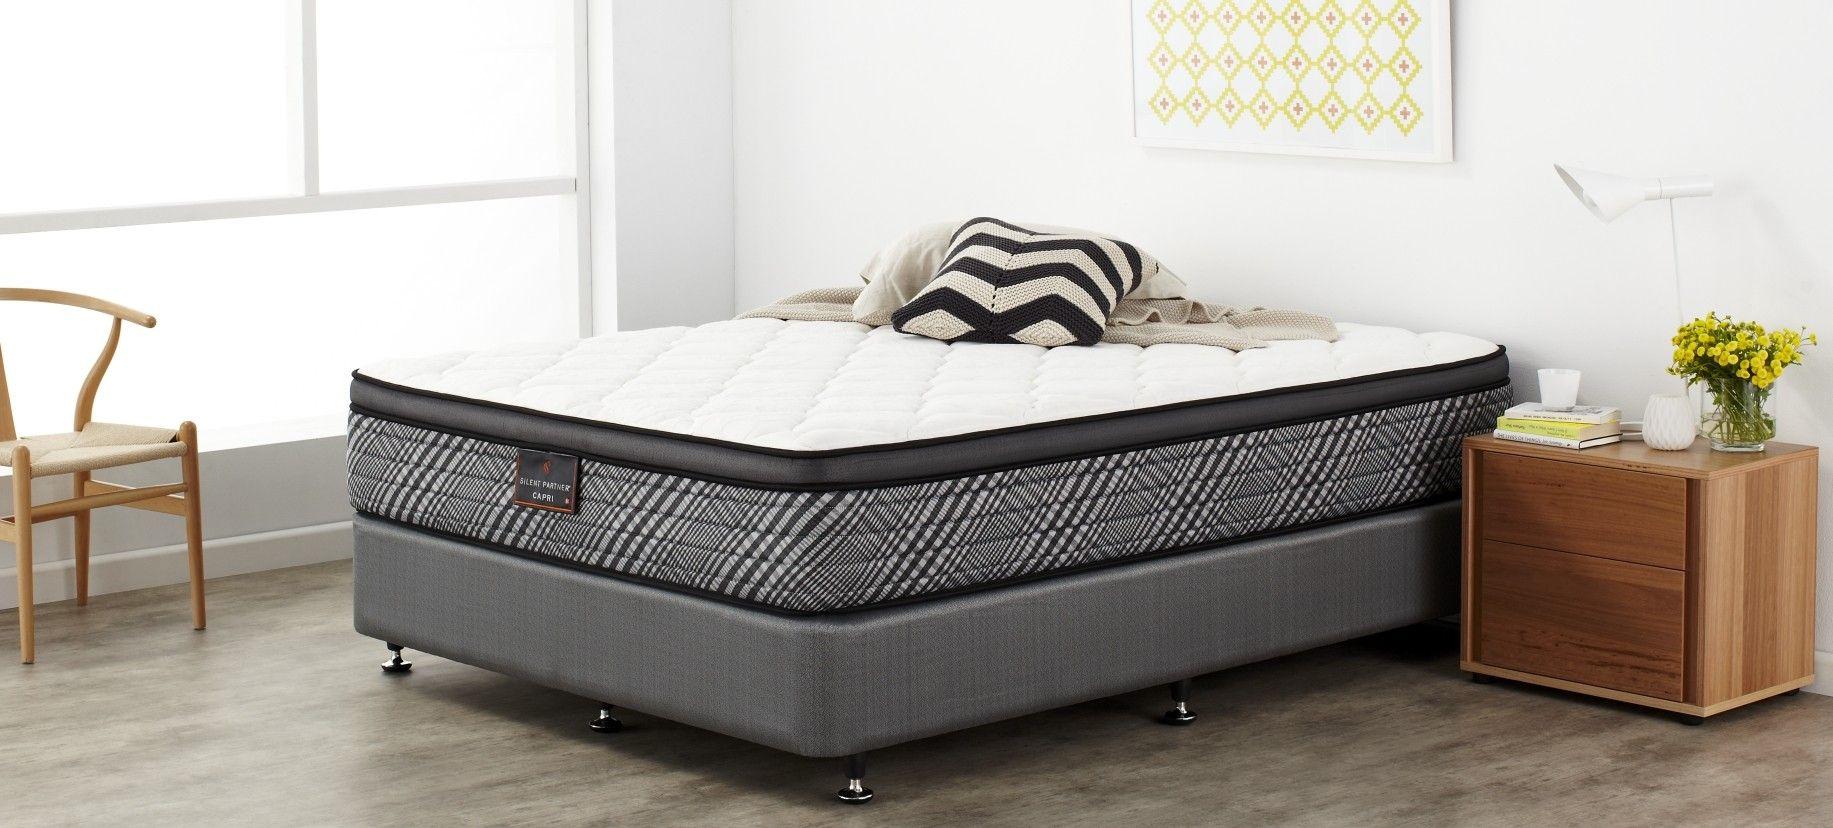 silent partner capri medium winners pinterest mattress and ranges